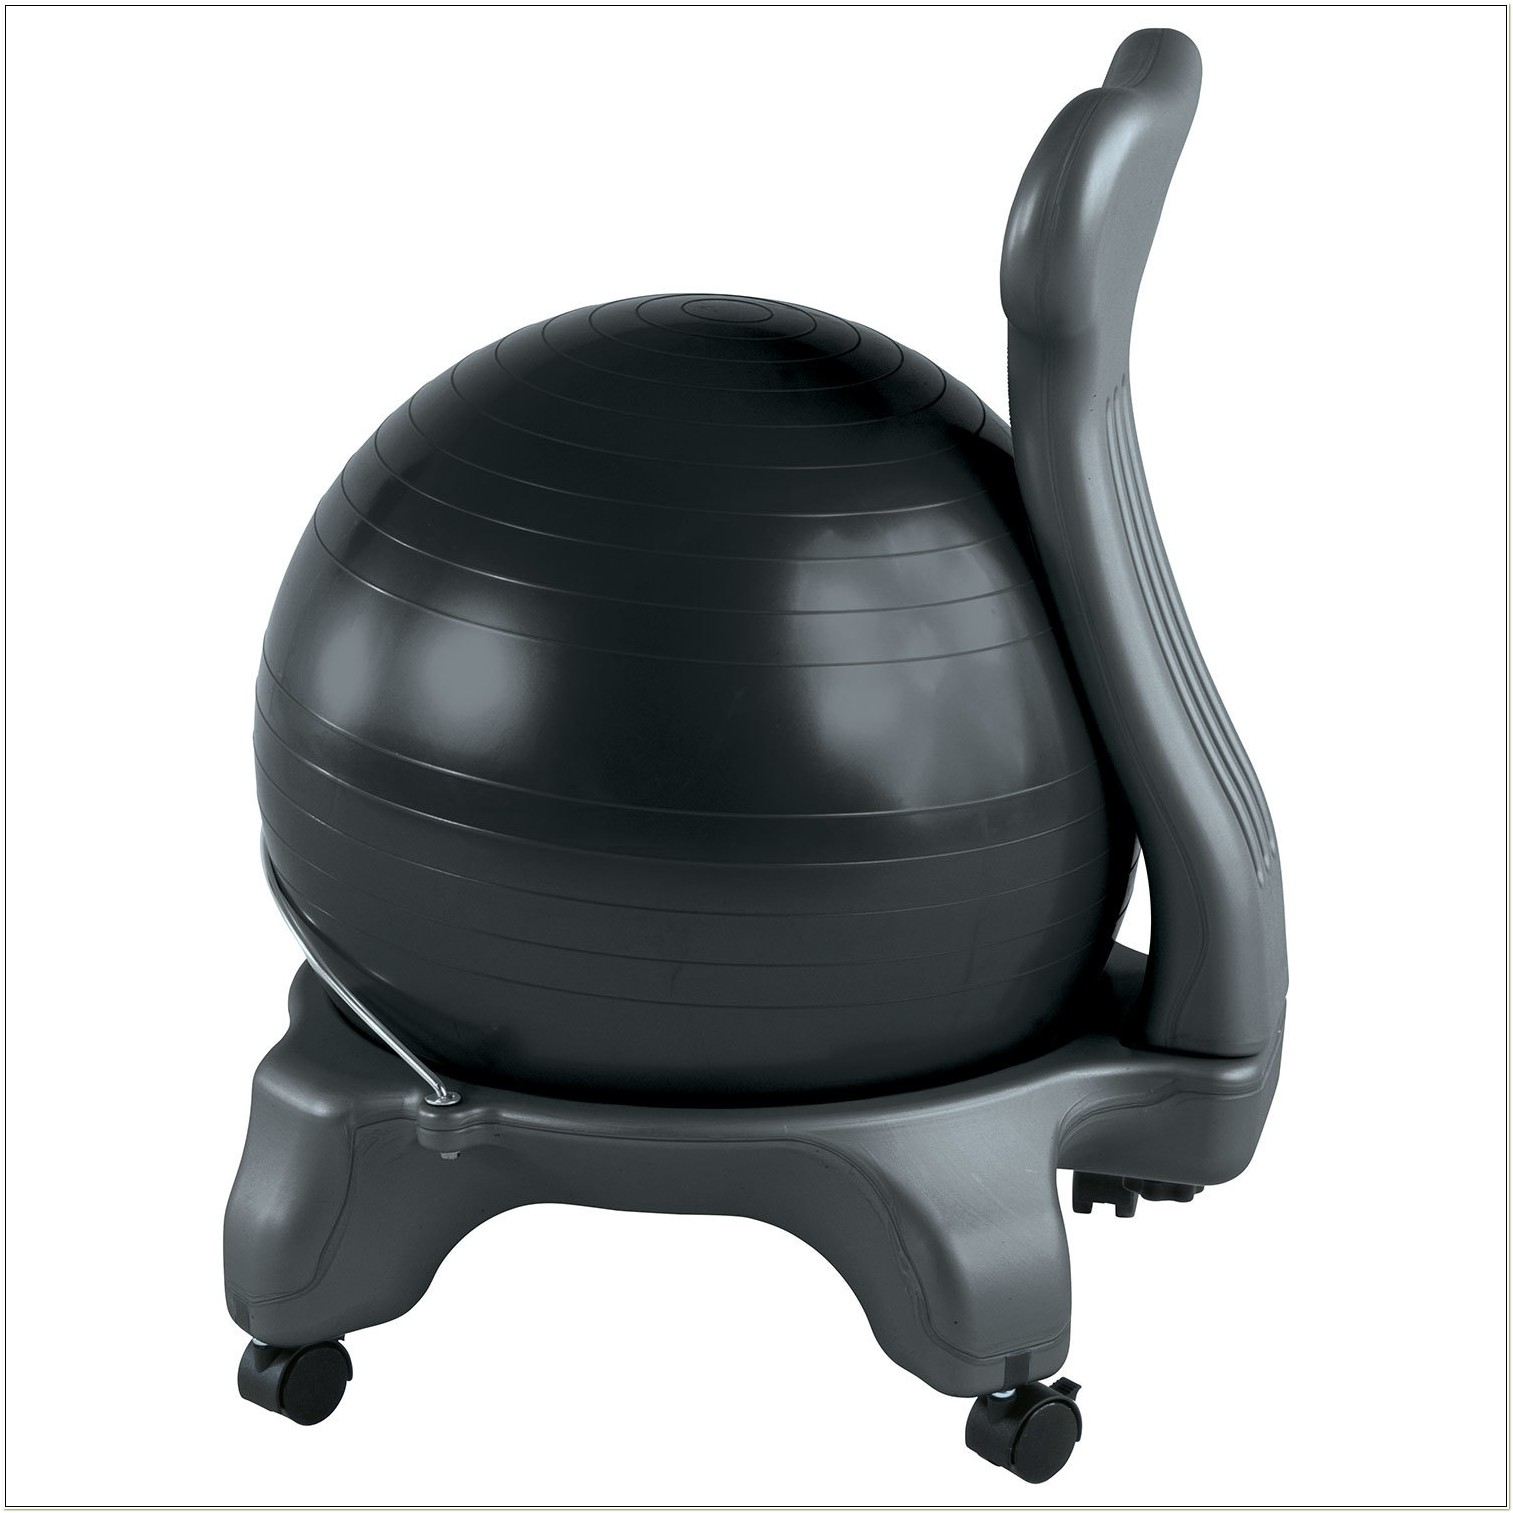 Gaiam Classic Balance Ball Chair Charcoal